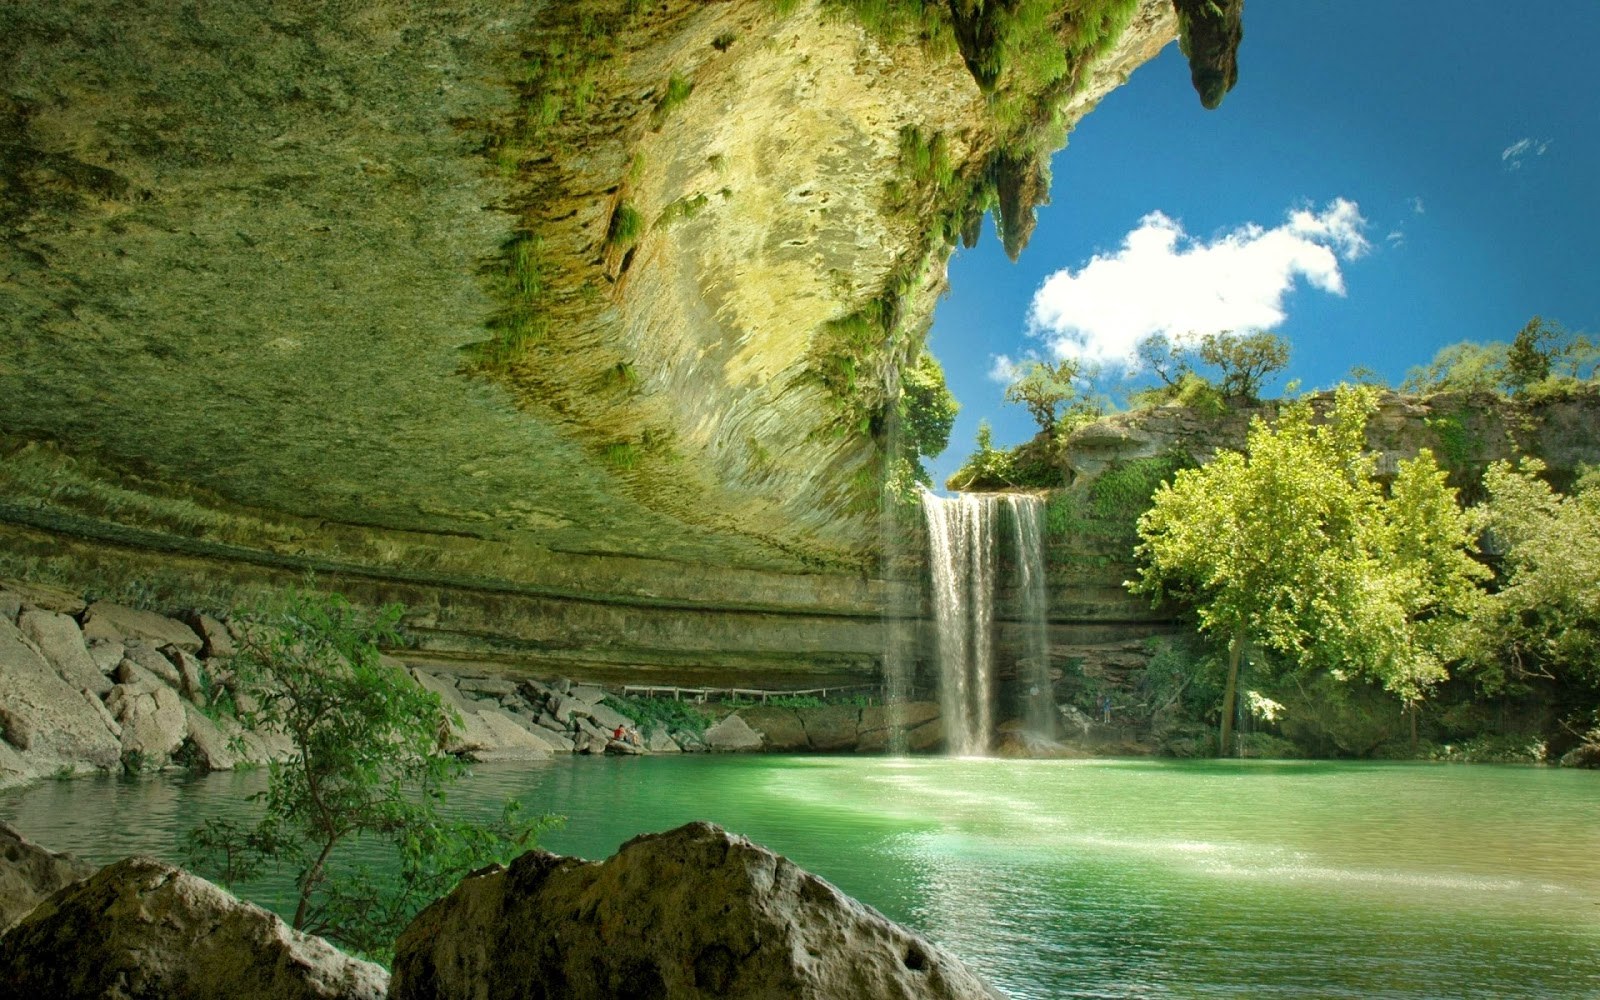 essay on natural beauty of pakistan